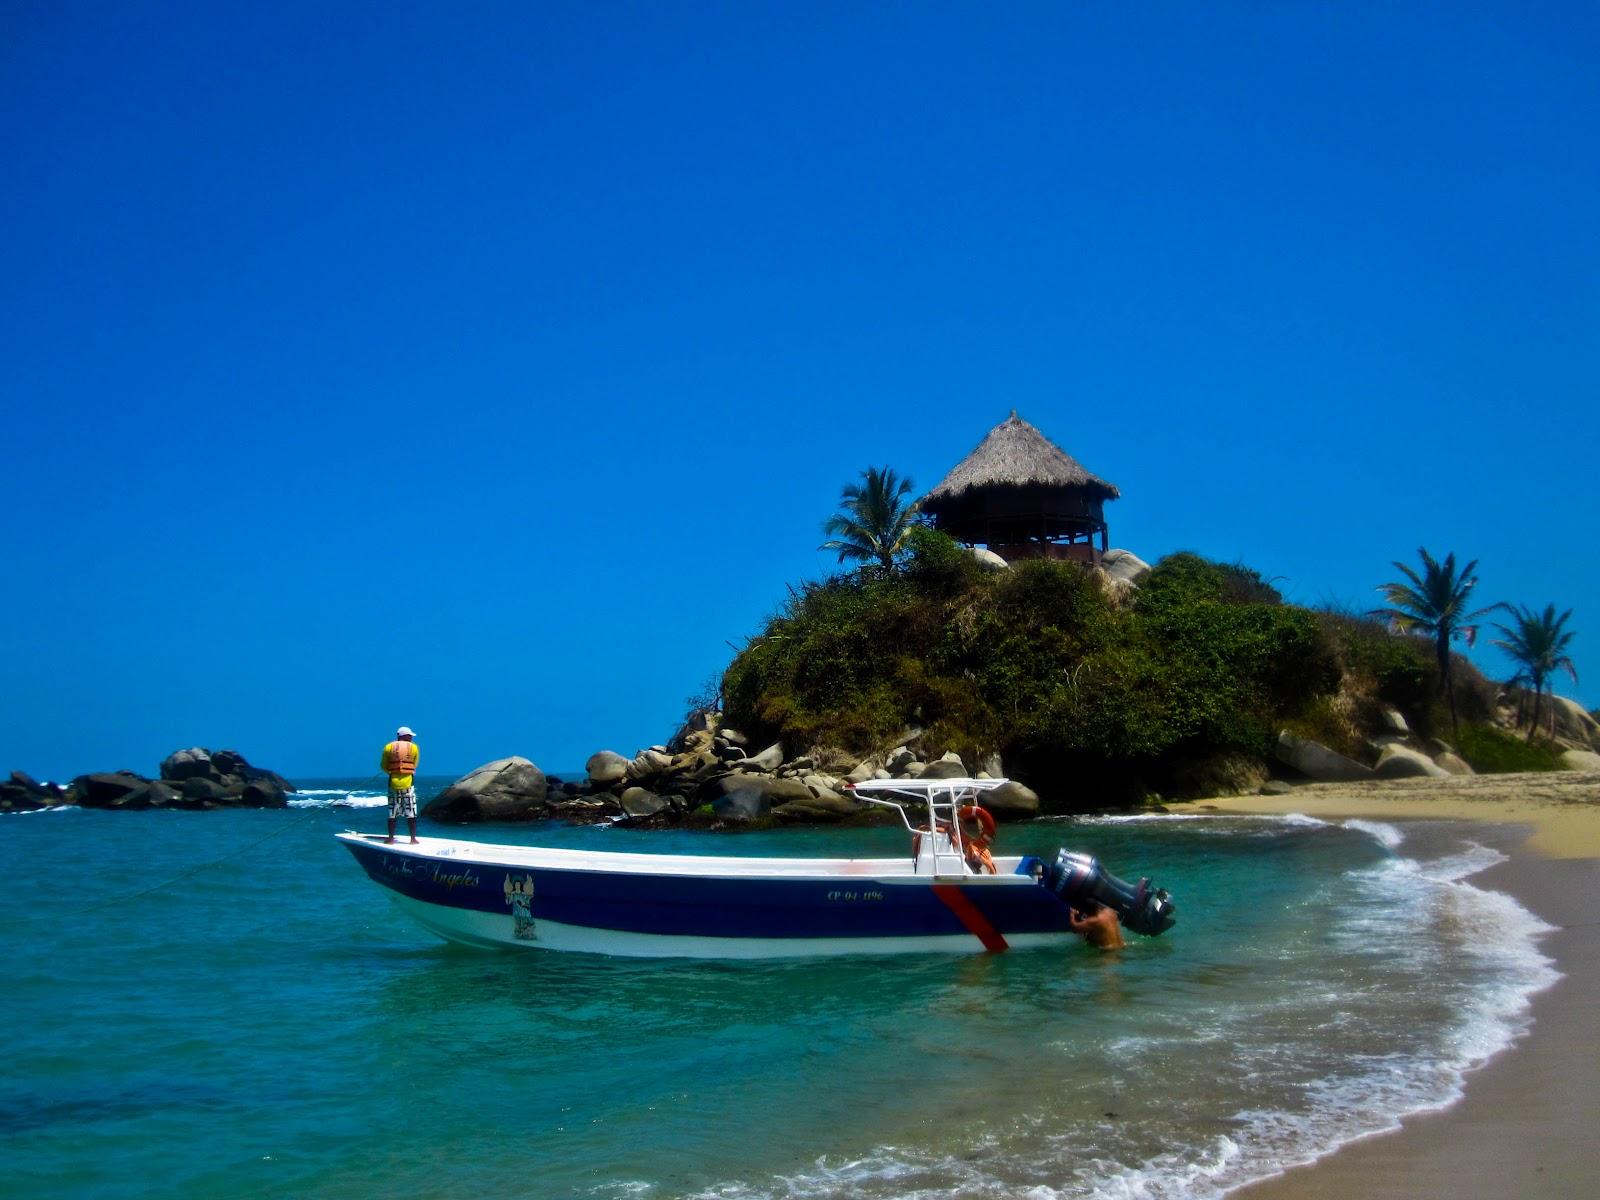 Parque Tayrona: Colombia's White Sand Caribbean Beaches - Trading ...